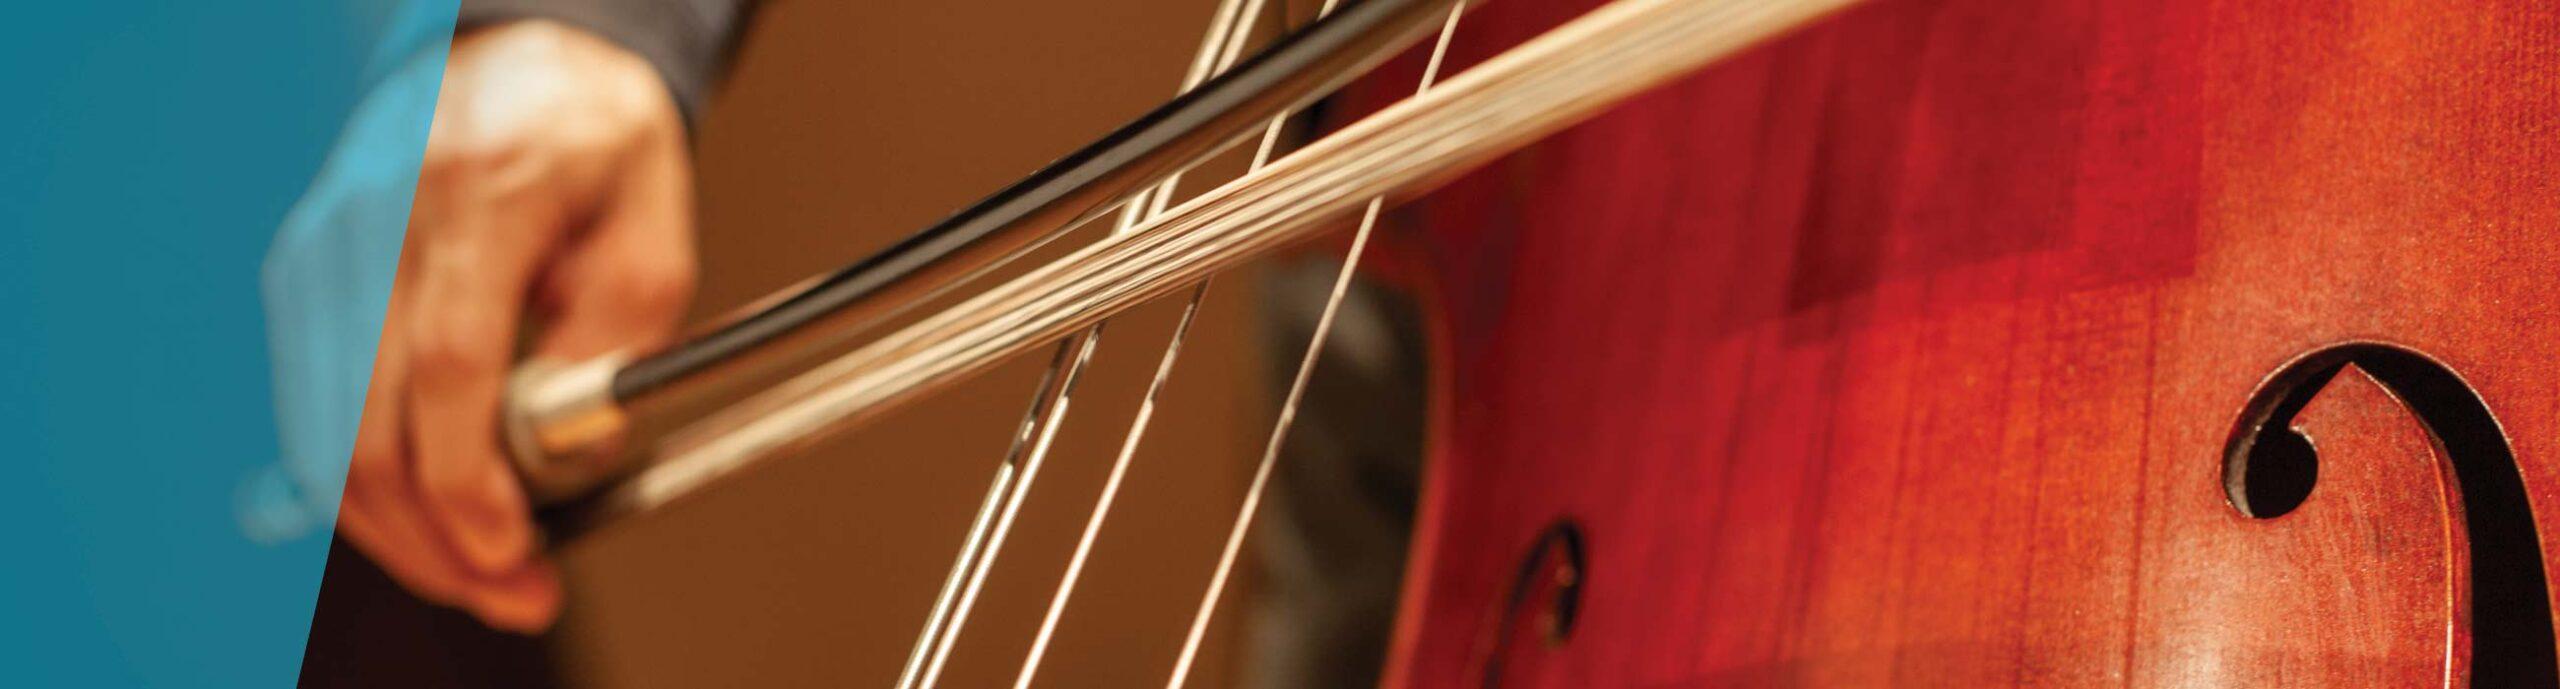 Close up photo of cello